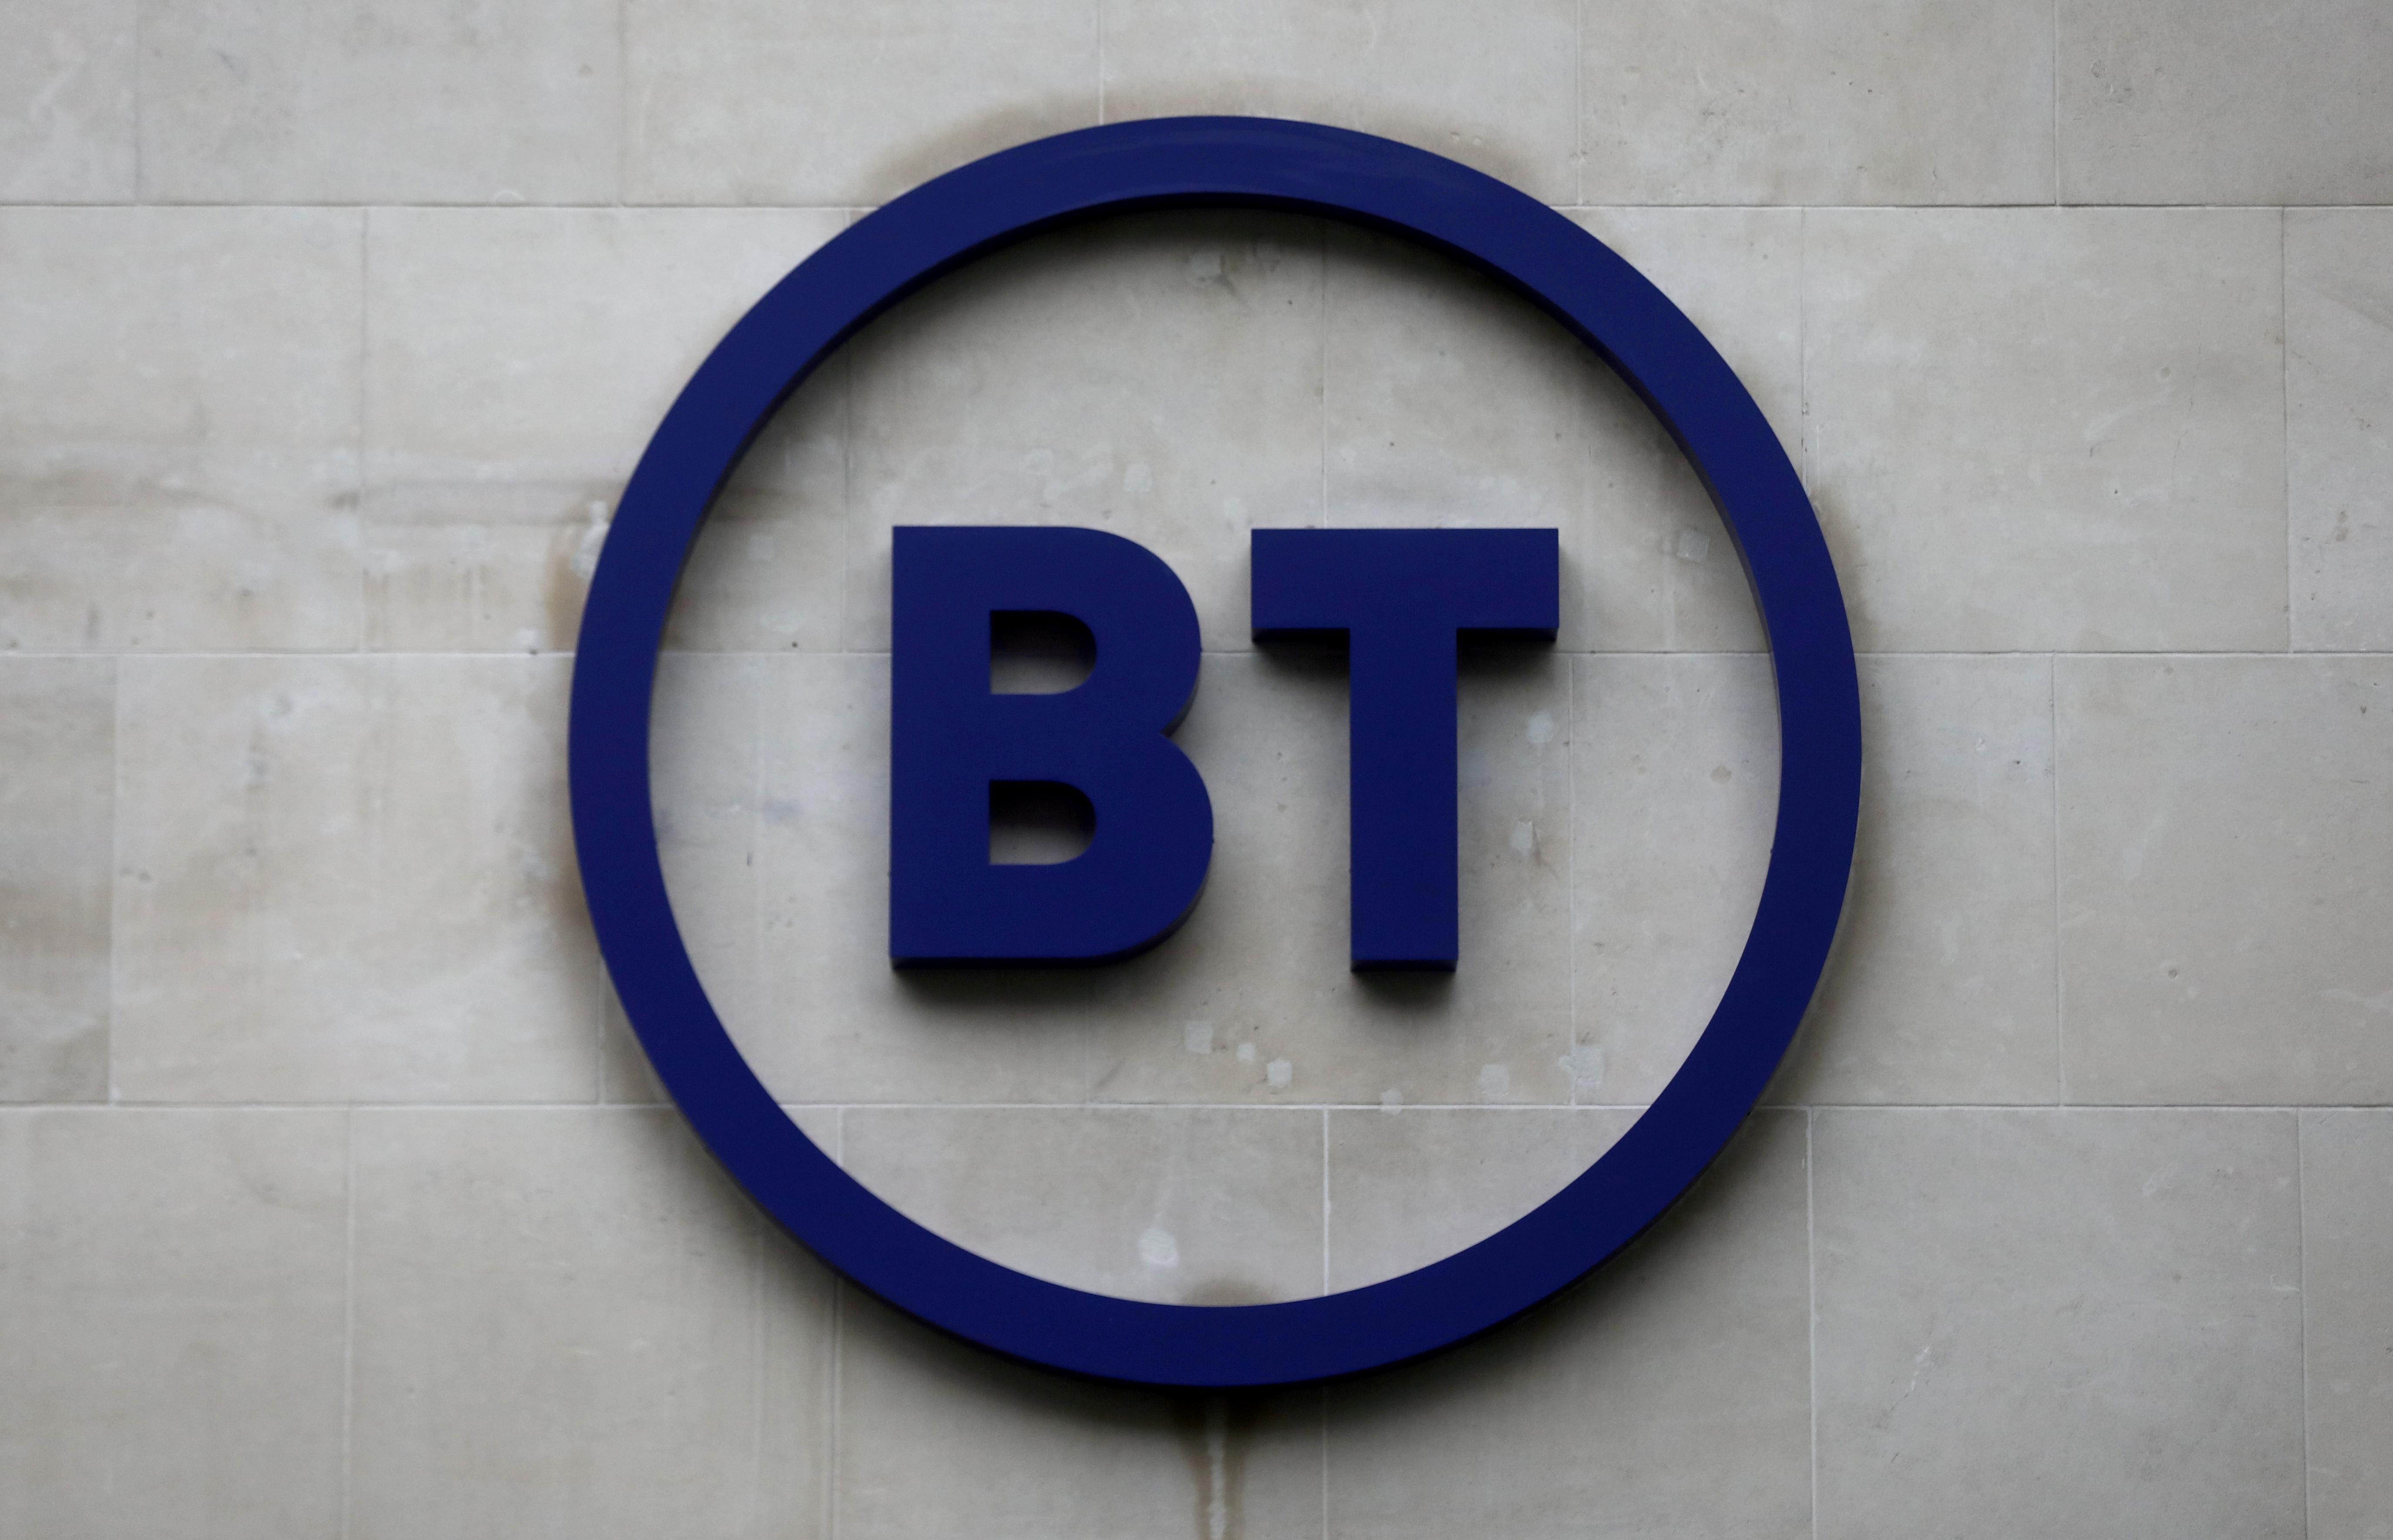 Company logo is displayed at British Telecom (BT) headquarters in London, Britain, November 15, 2019. REUTERS/Simon Dawson/File Photo